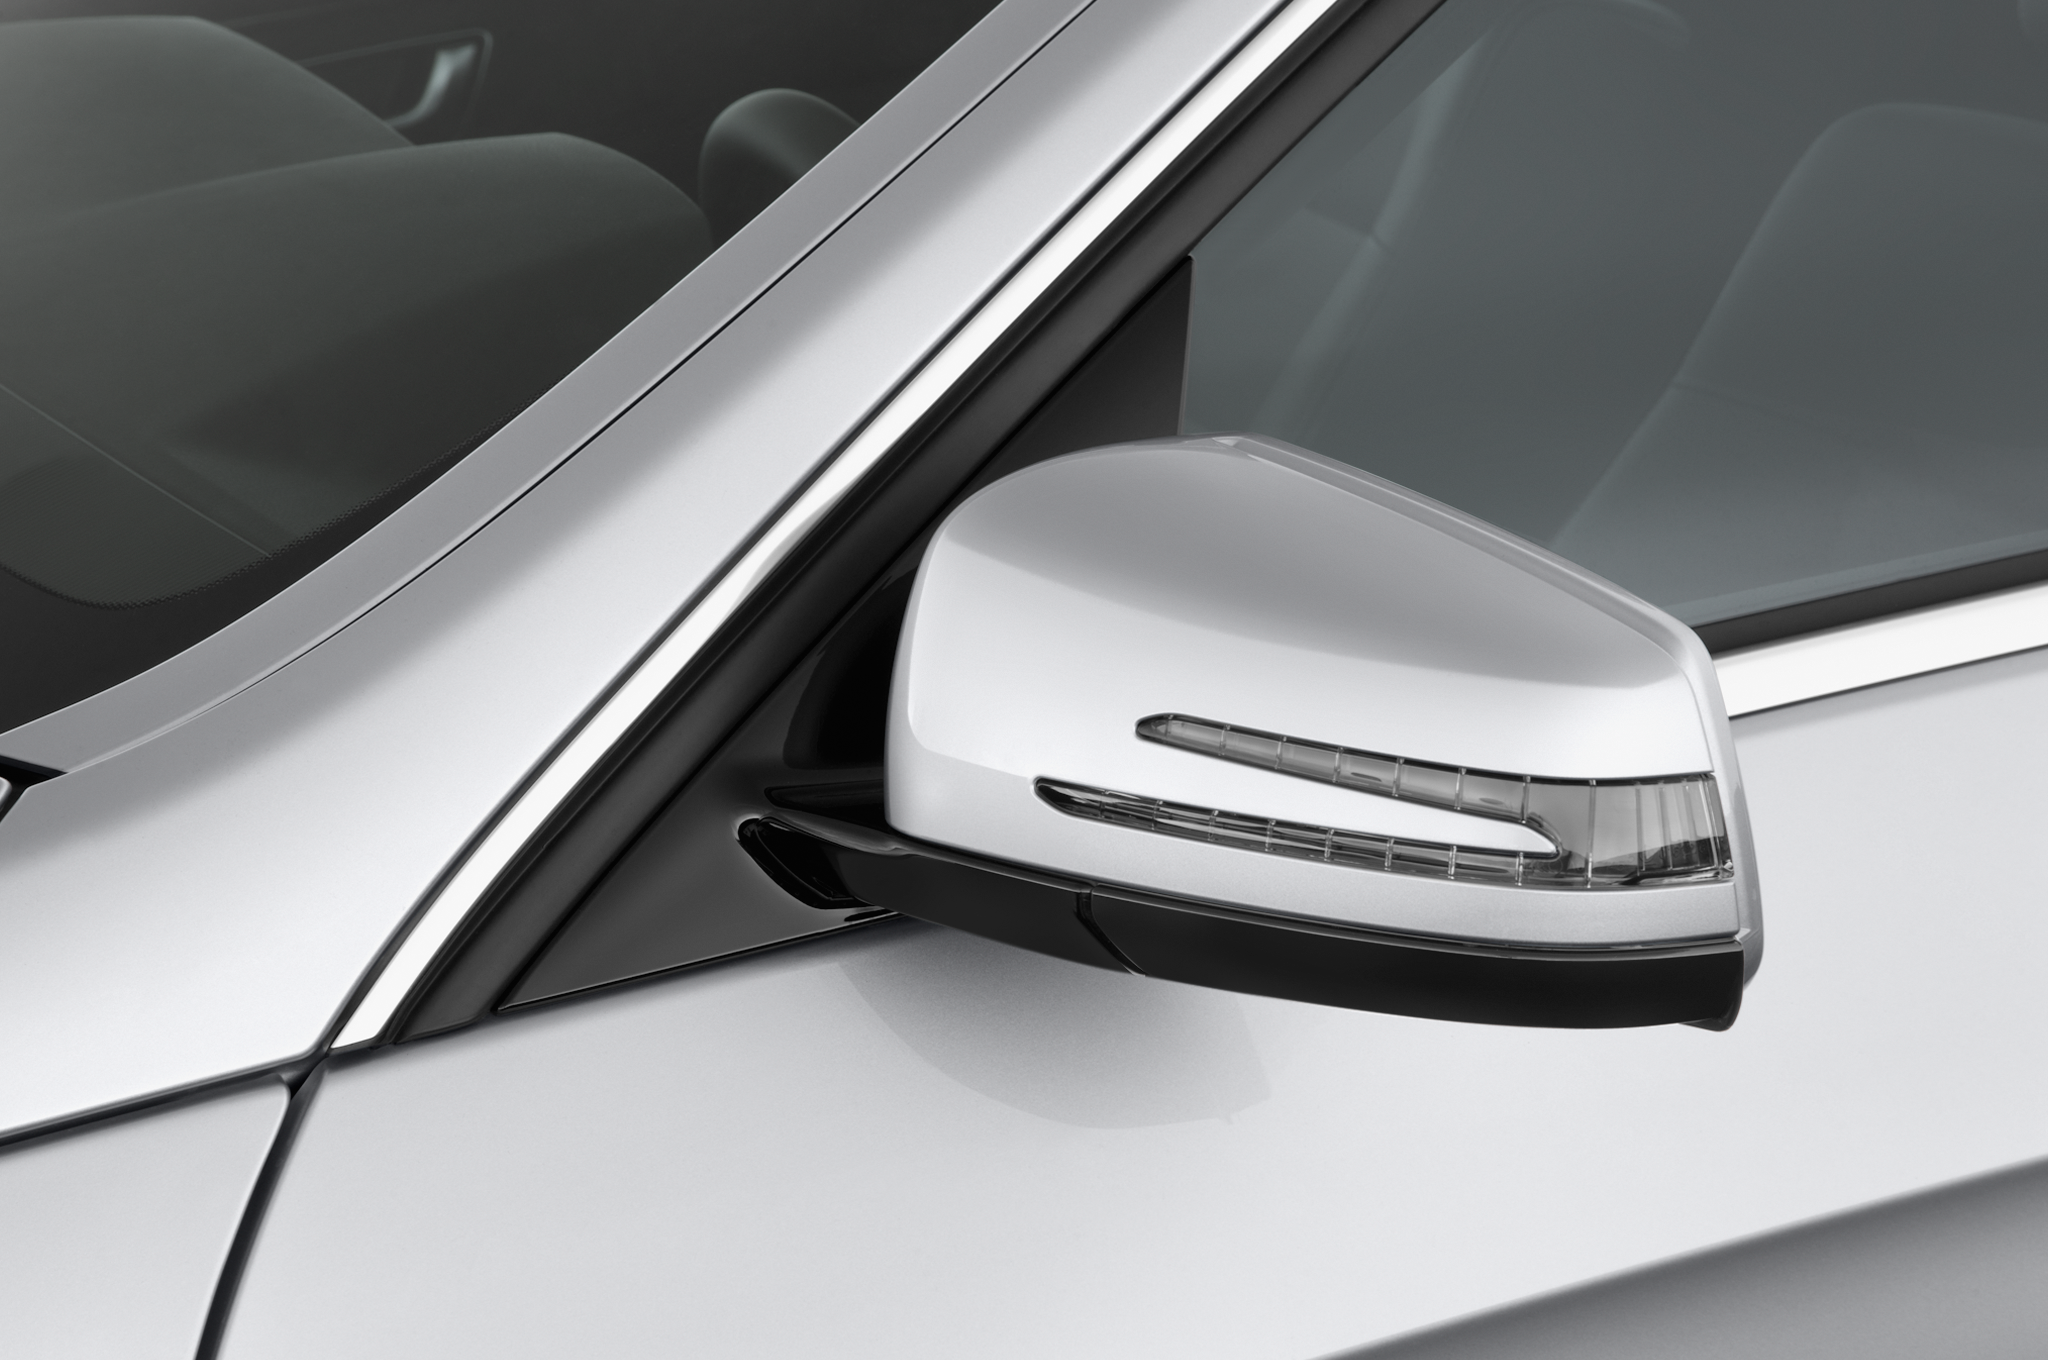 Mercedes-Benz E-Class: Adjusting the exterior mirrors